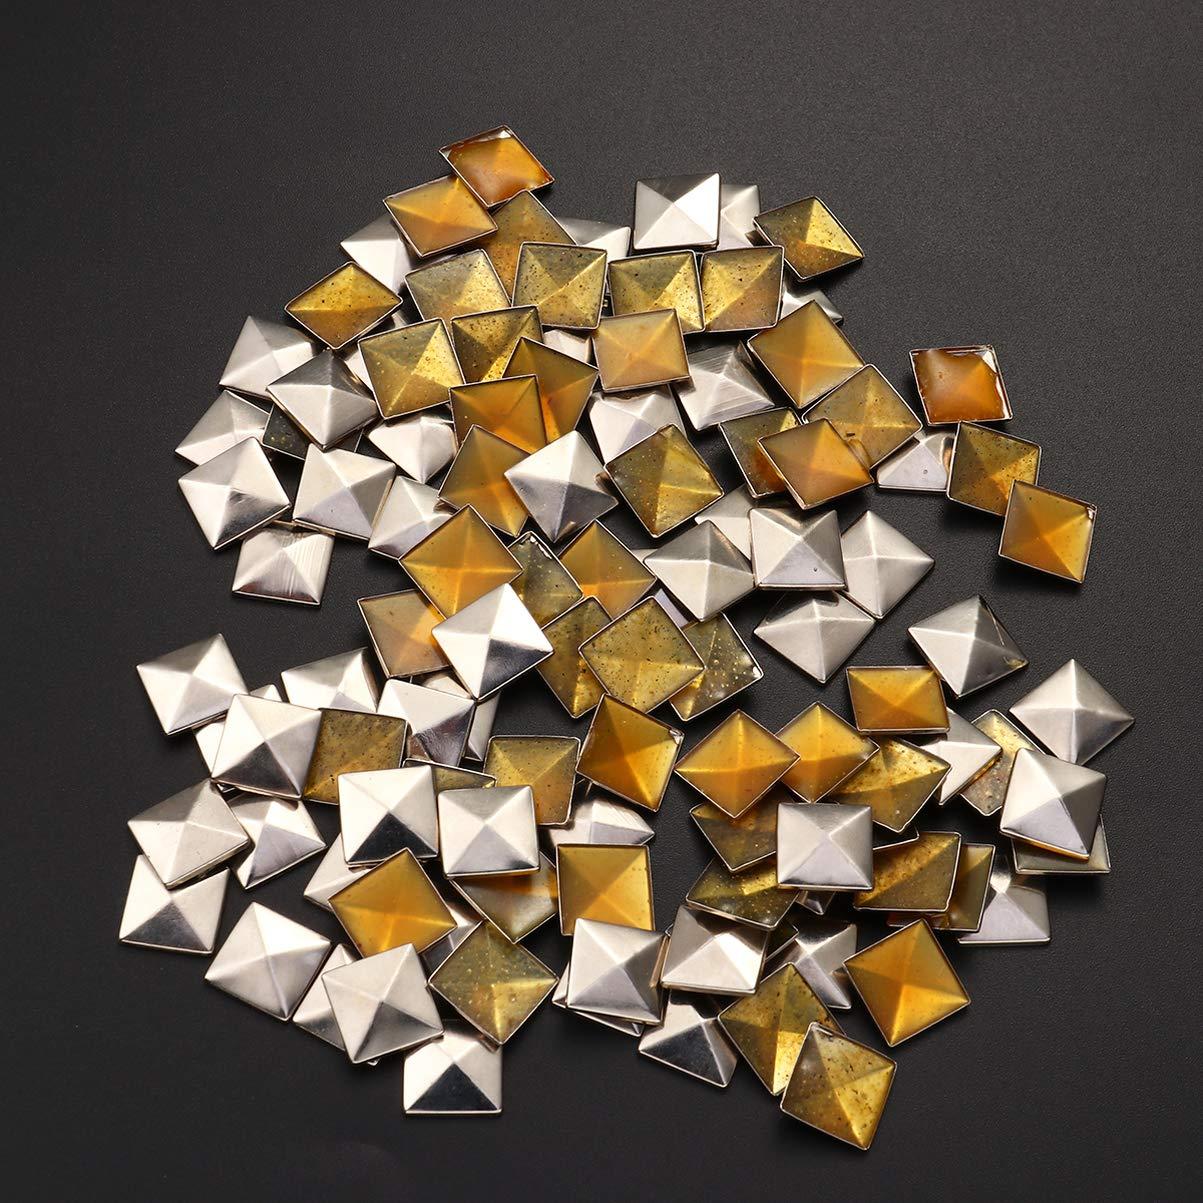 Healifty 100pcs tachuelas planas remaches de cuero tachuelas pegamento en tachuelas para bolsos artesanales ropa cintur/ón zapatos bronce